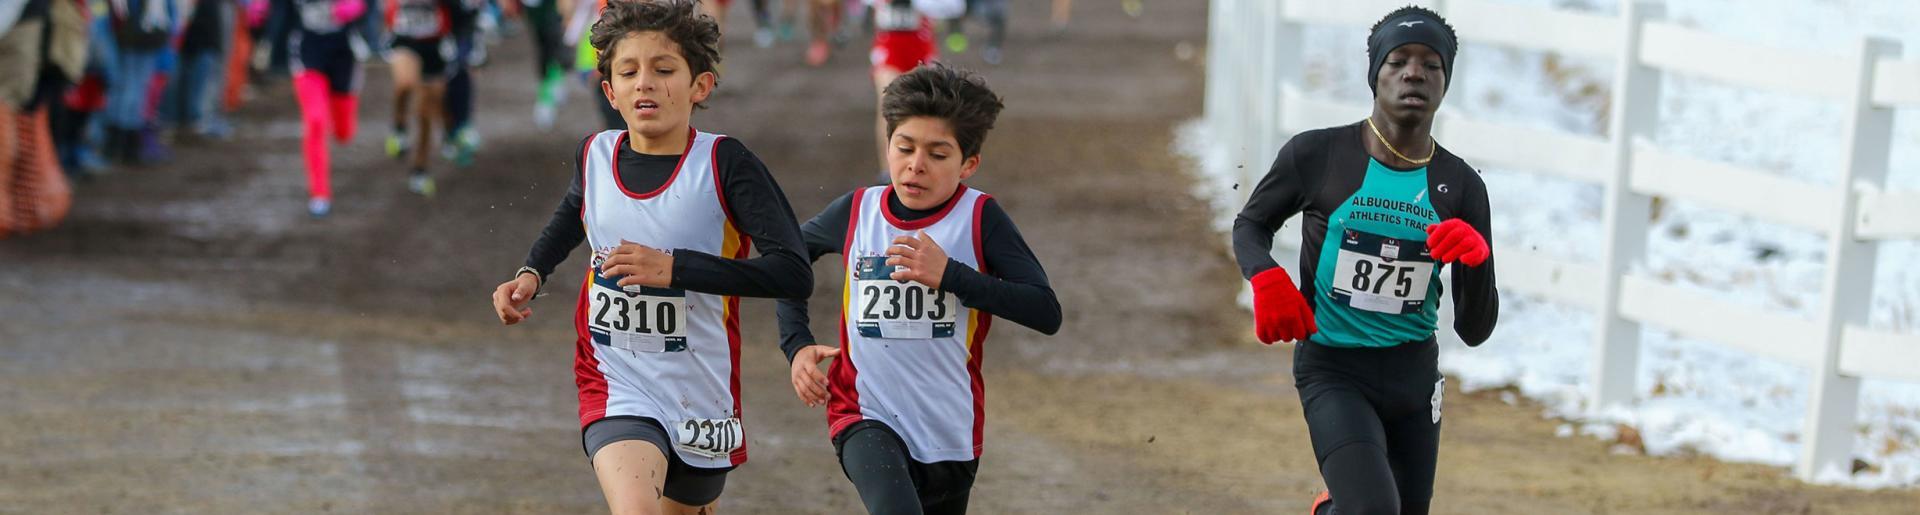 Three school-aged boys run uphill in cross country meet.